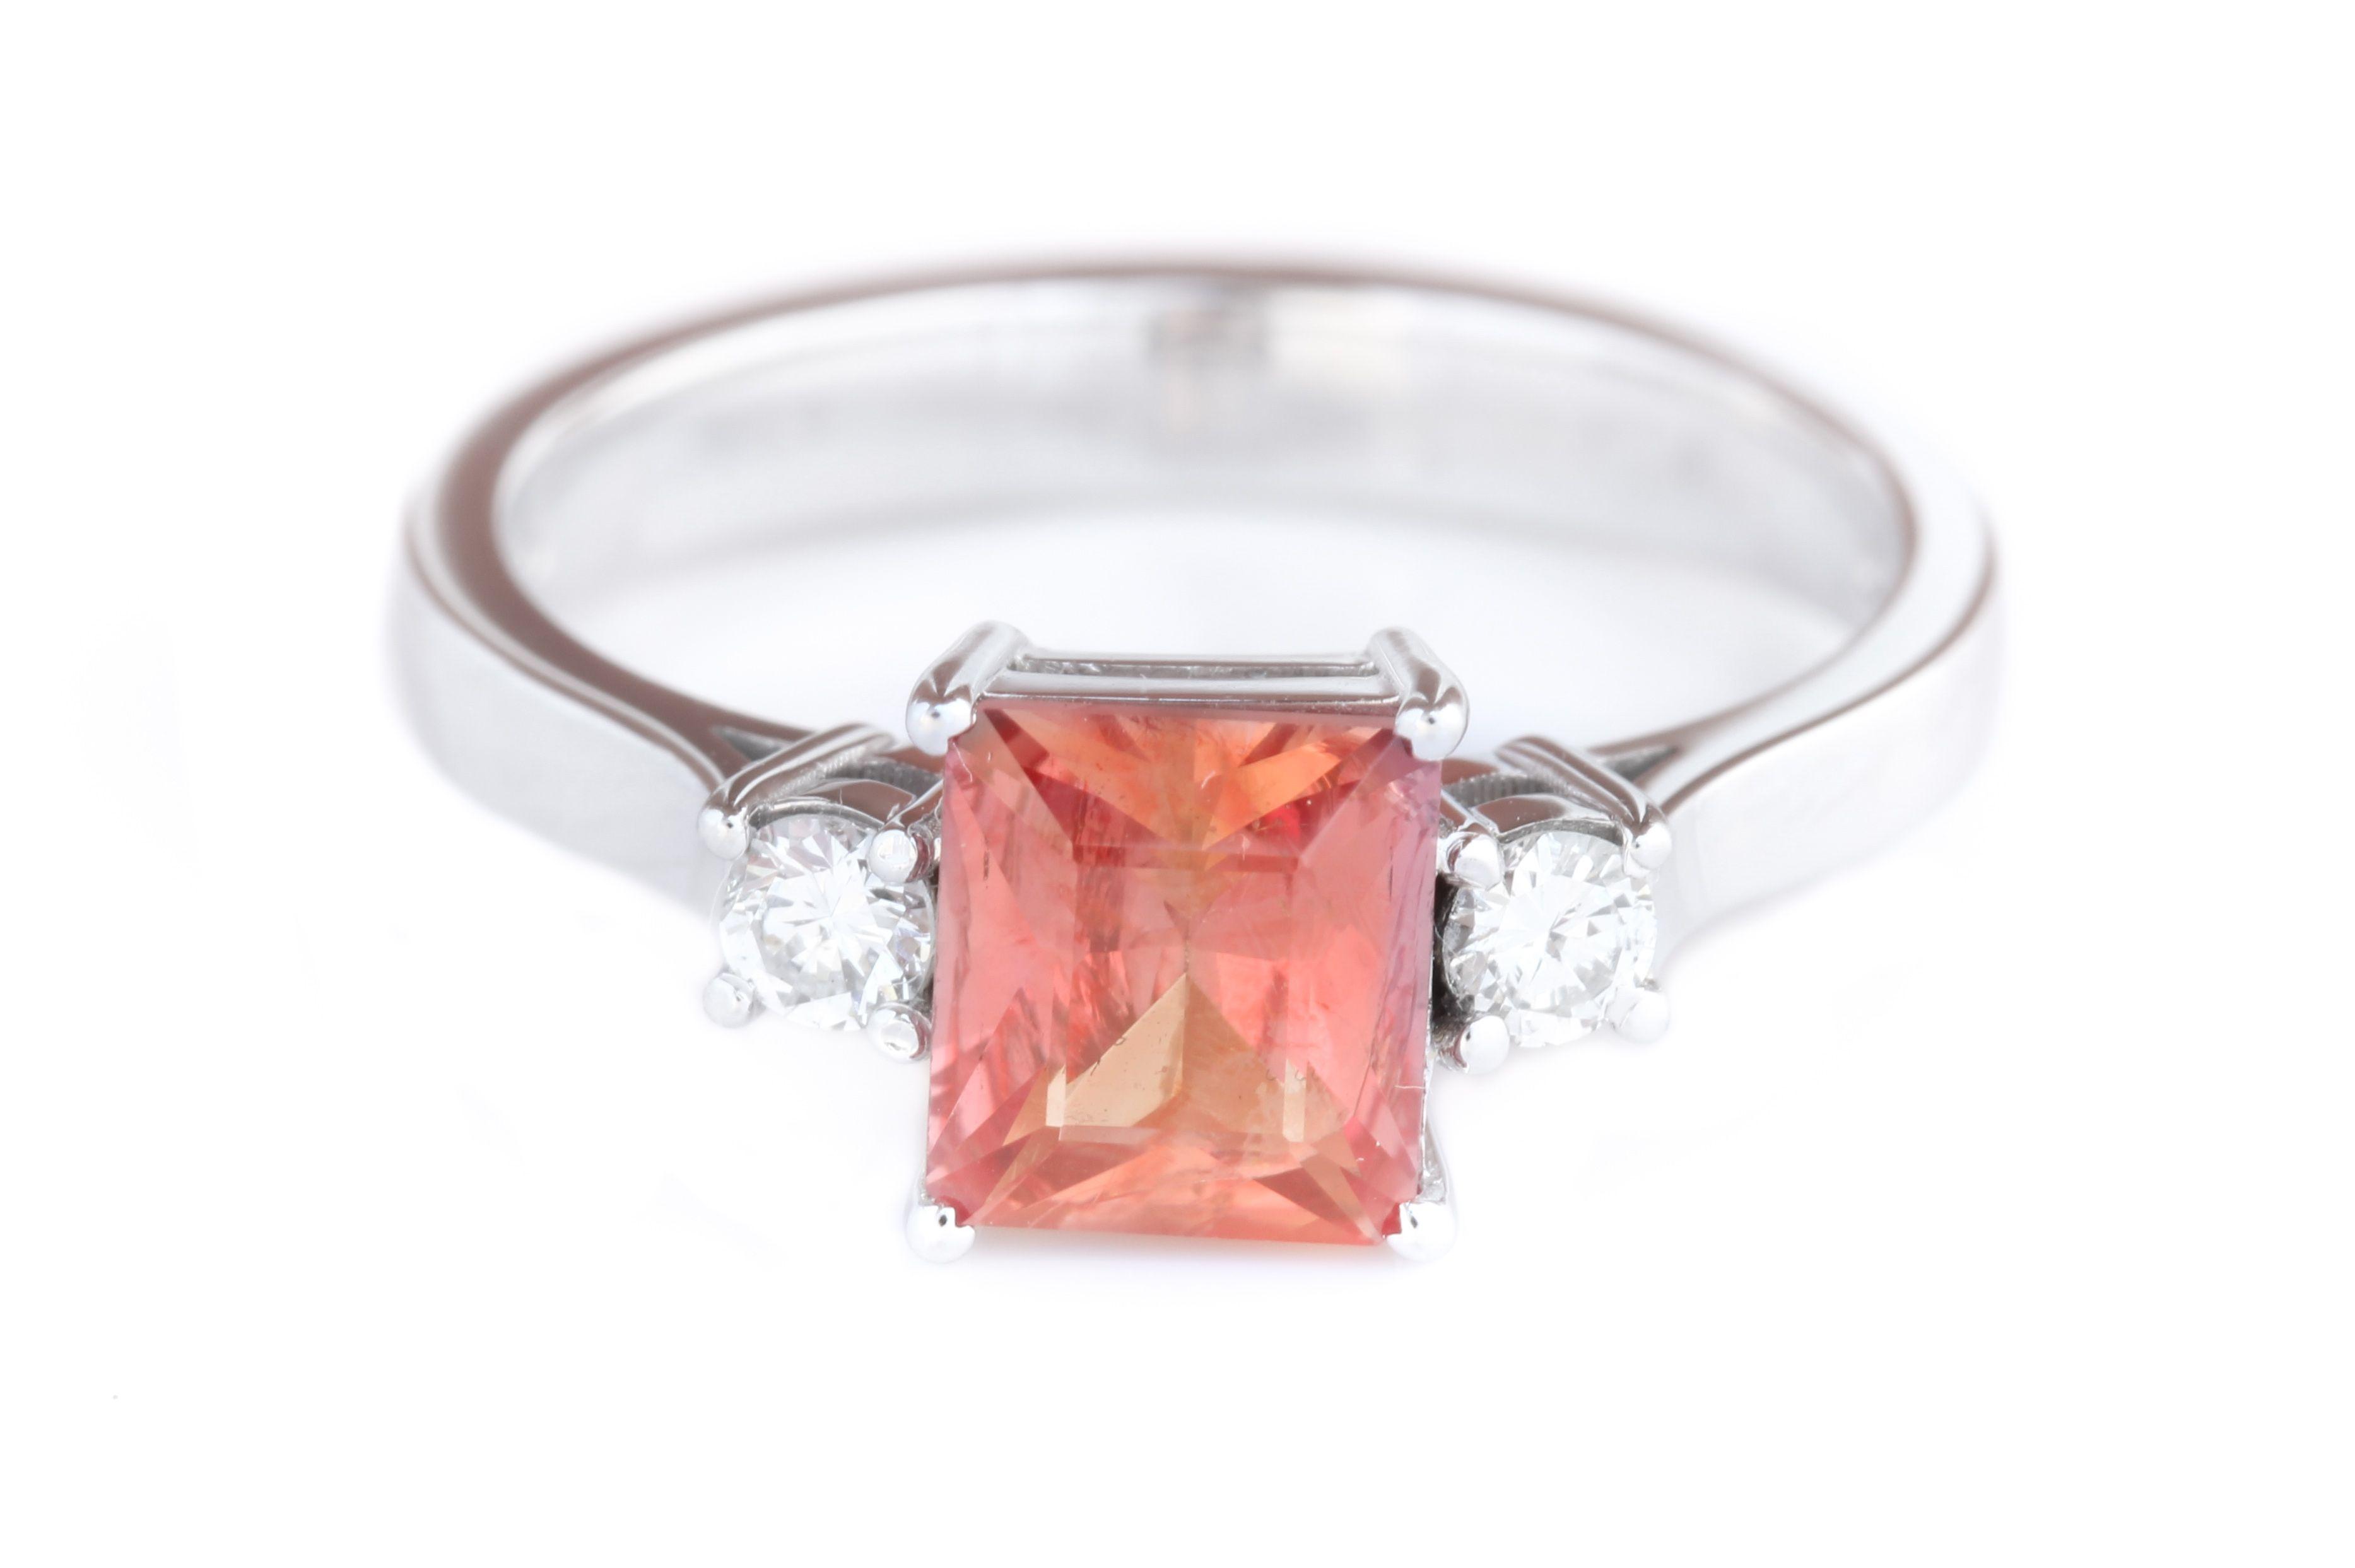 Padparadscha sapphire ct cts diamonds set in k white